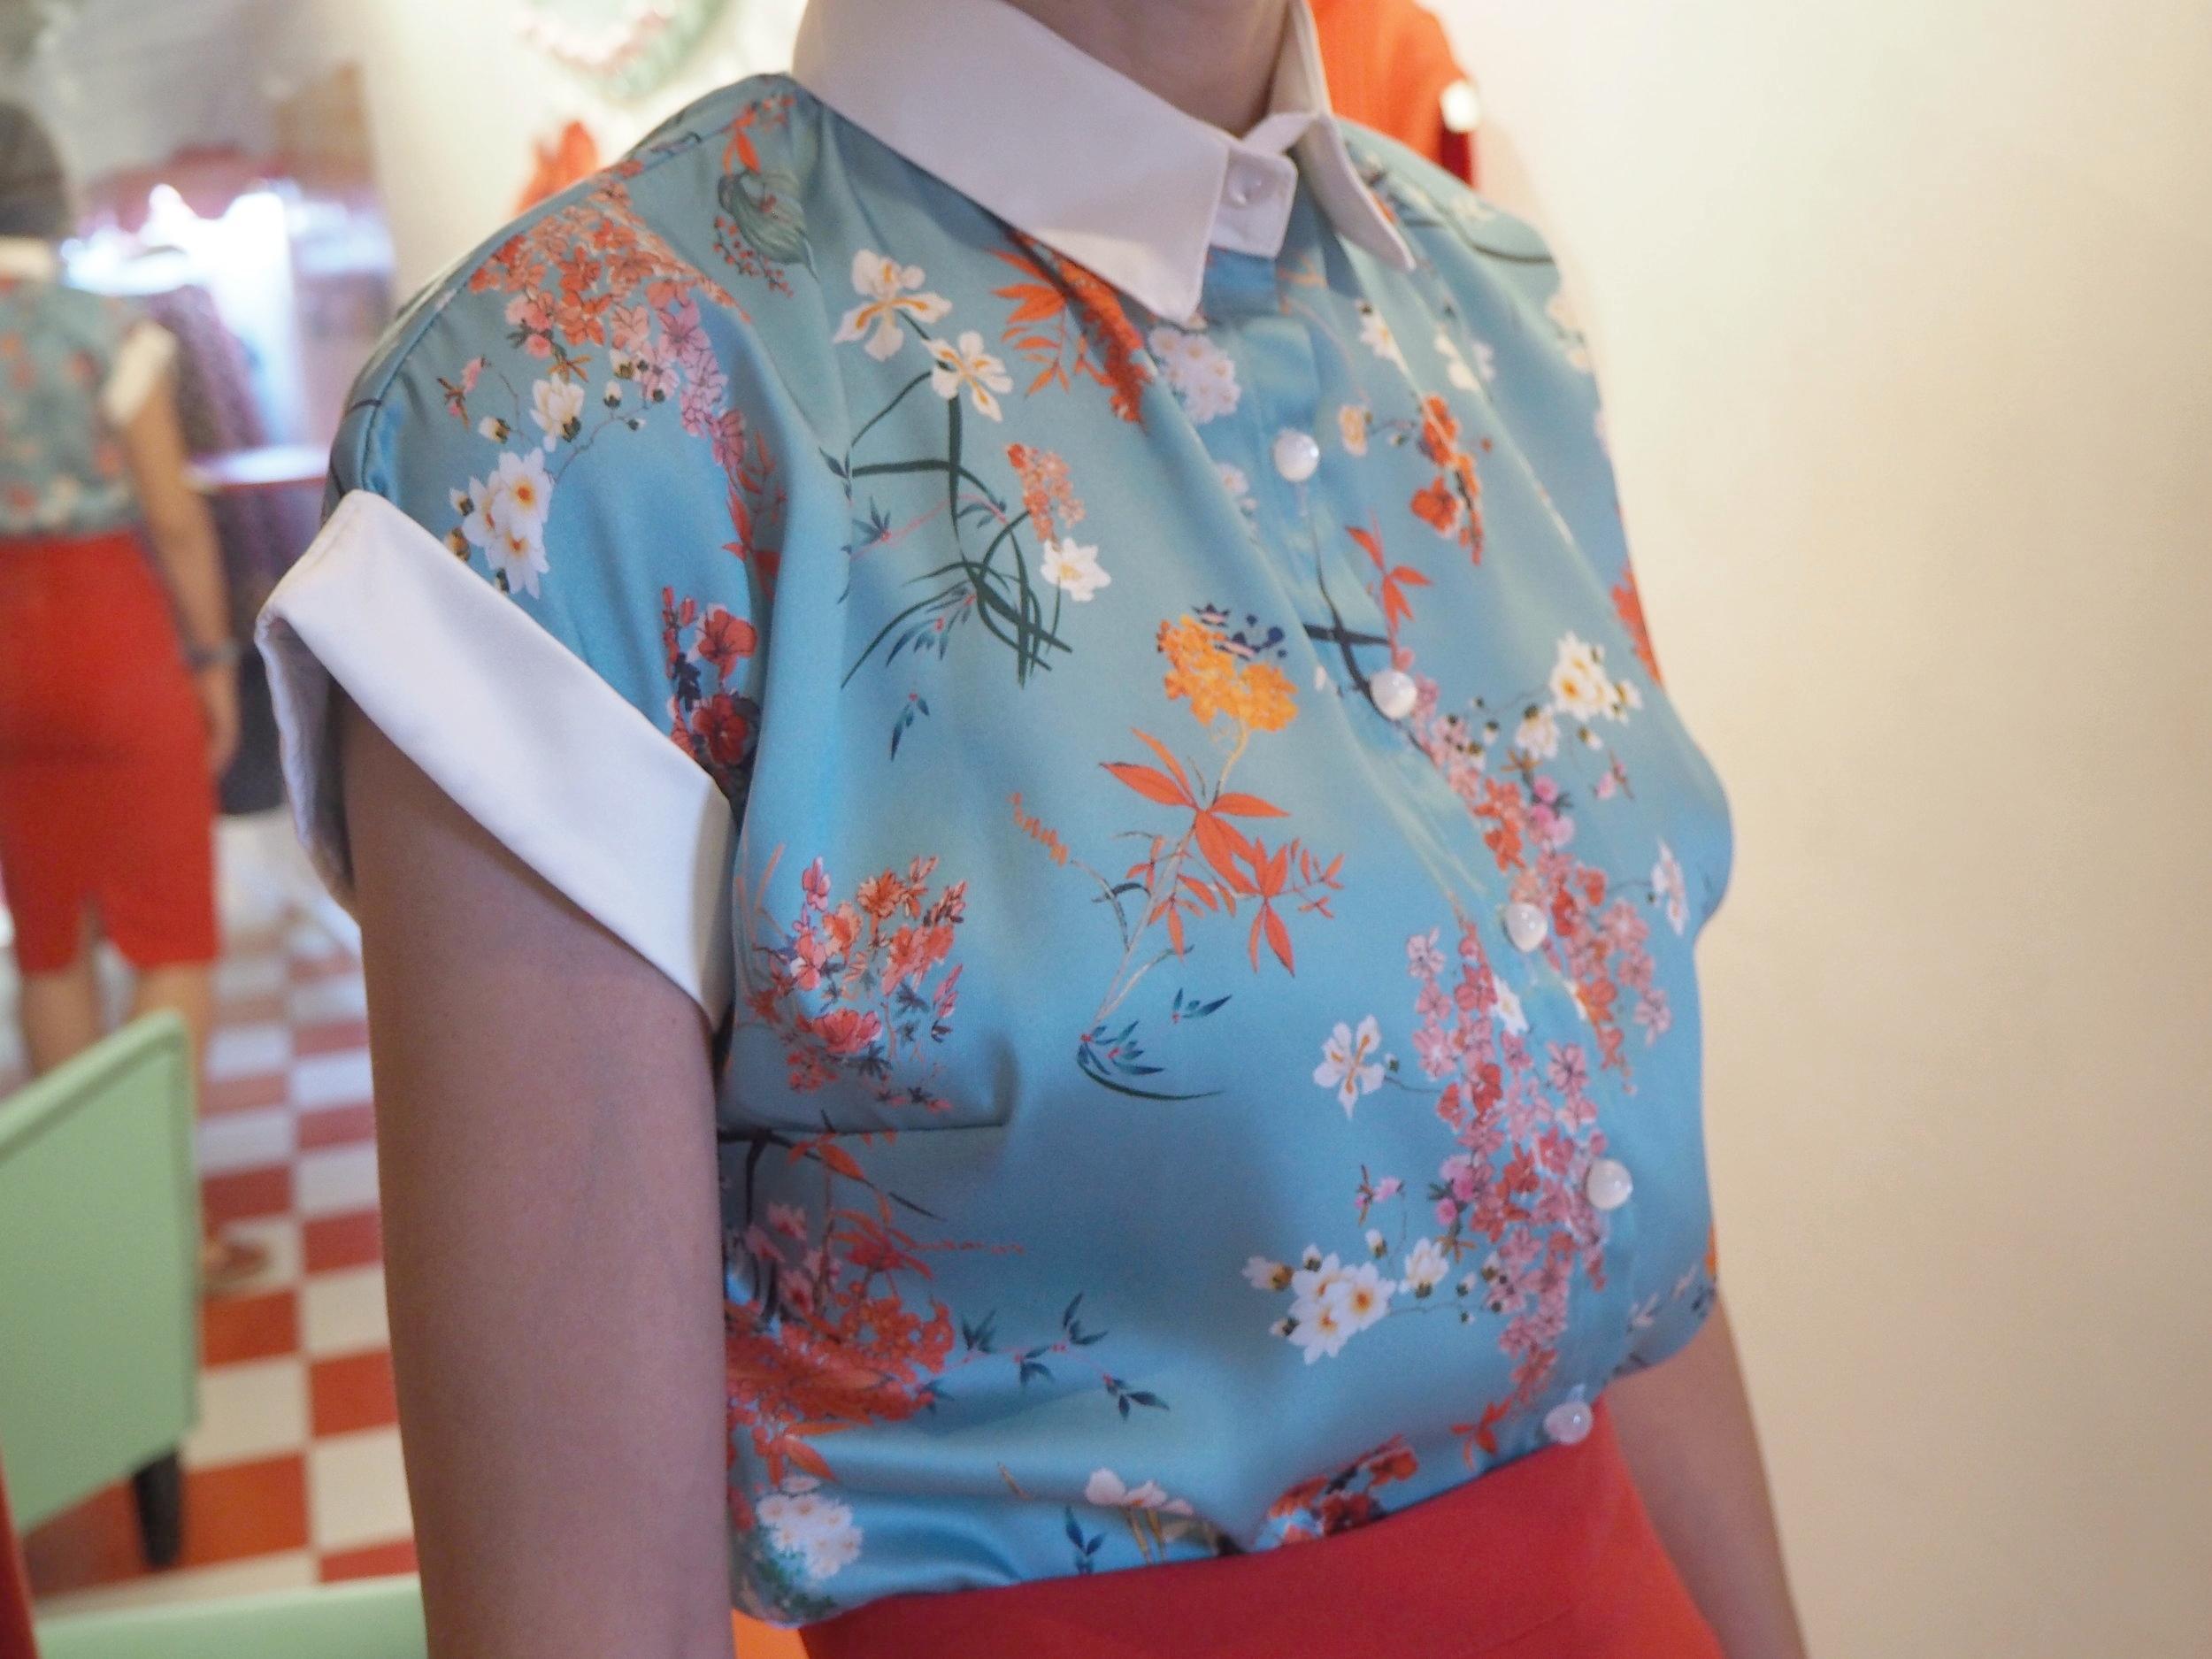 tiendas-ropa-madrid-originles-lady-cachuete-camisa-china.JPG